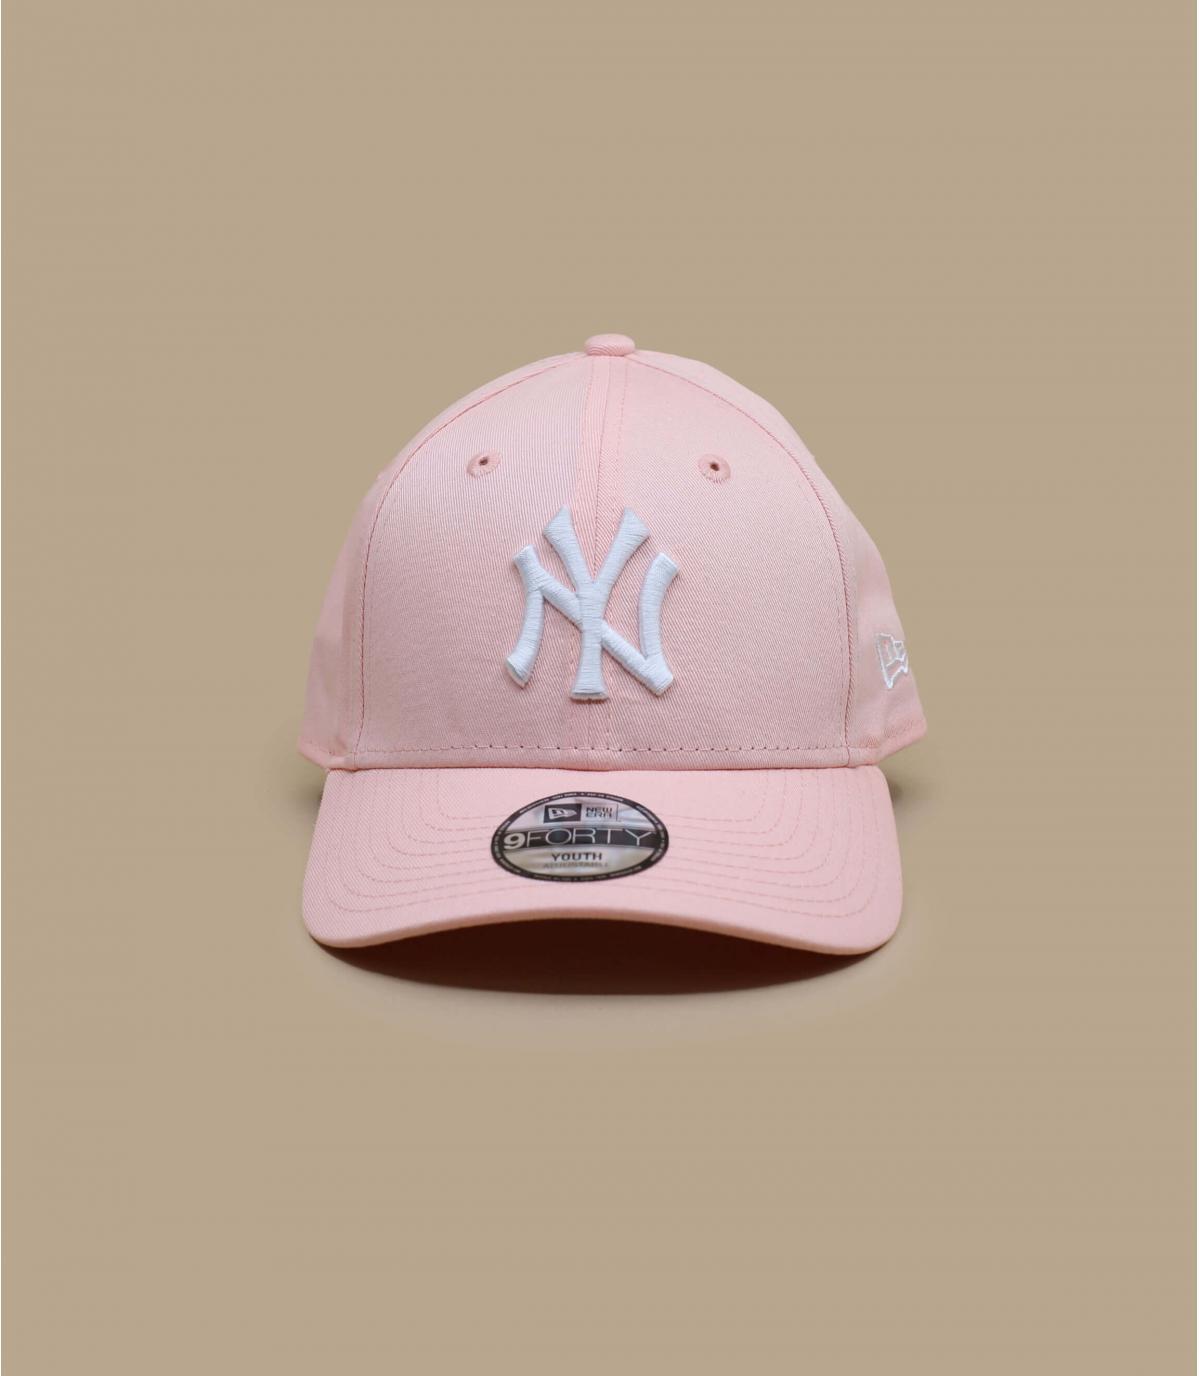 Details Cap Kids NY League Ess 940 pink limonade - Abbildung 2